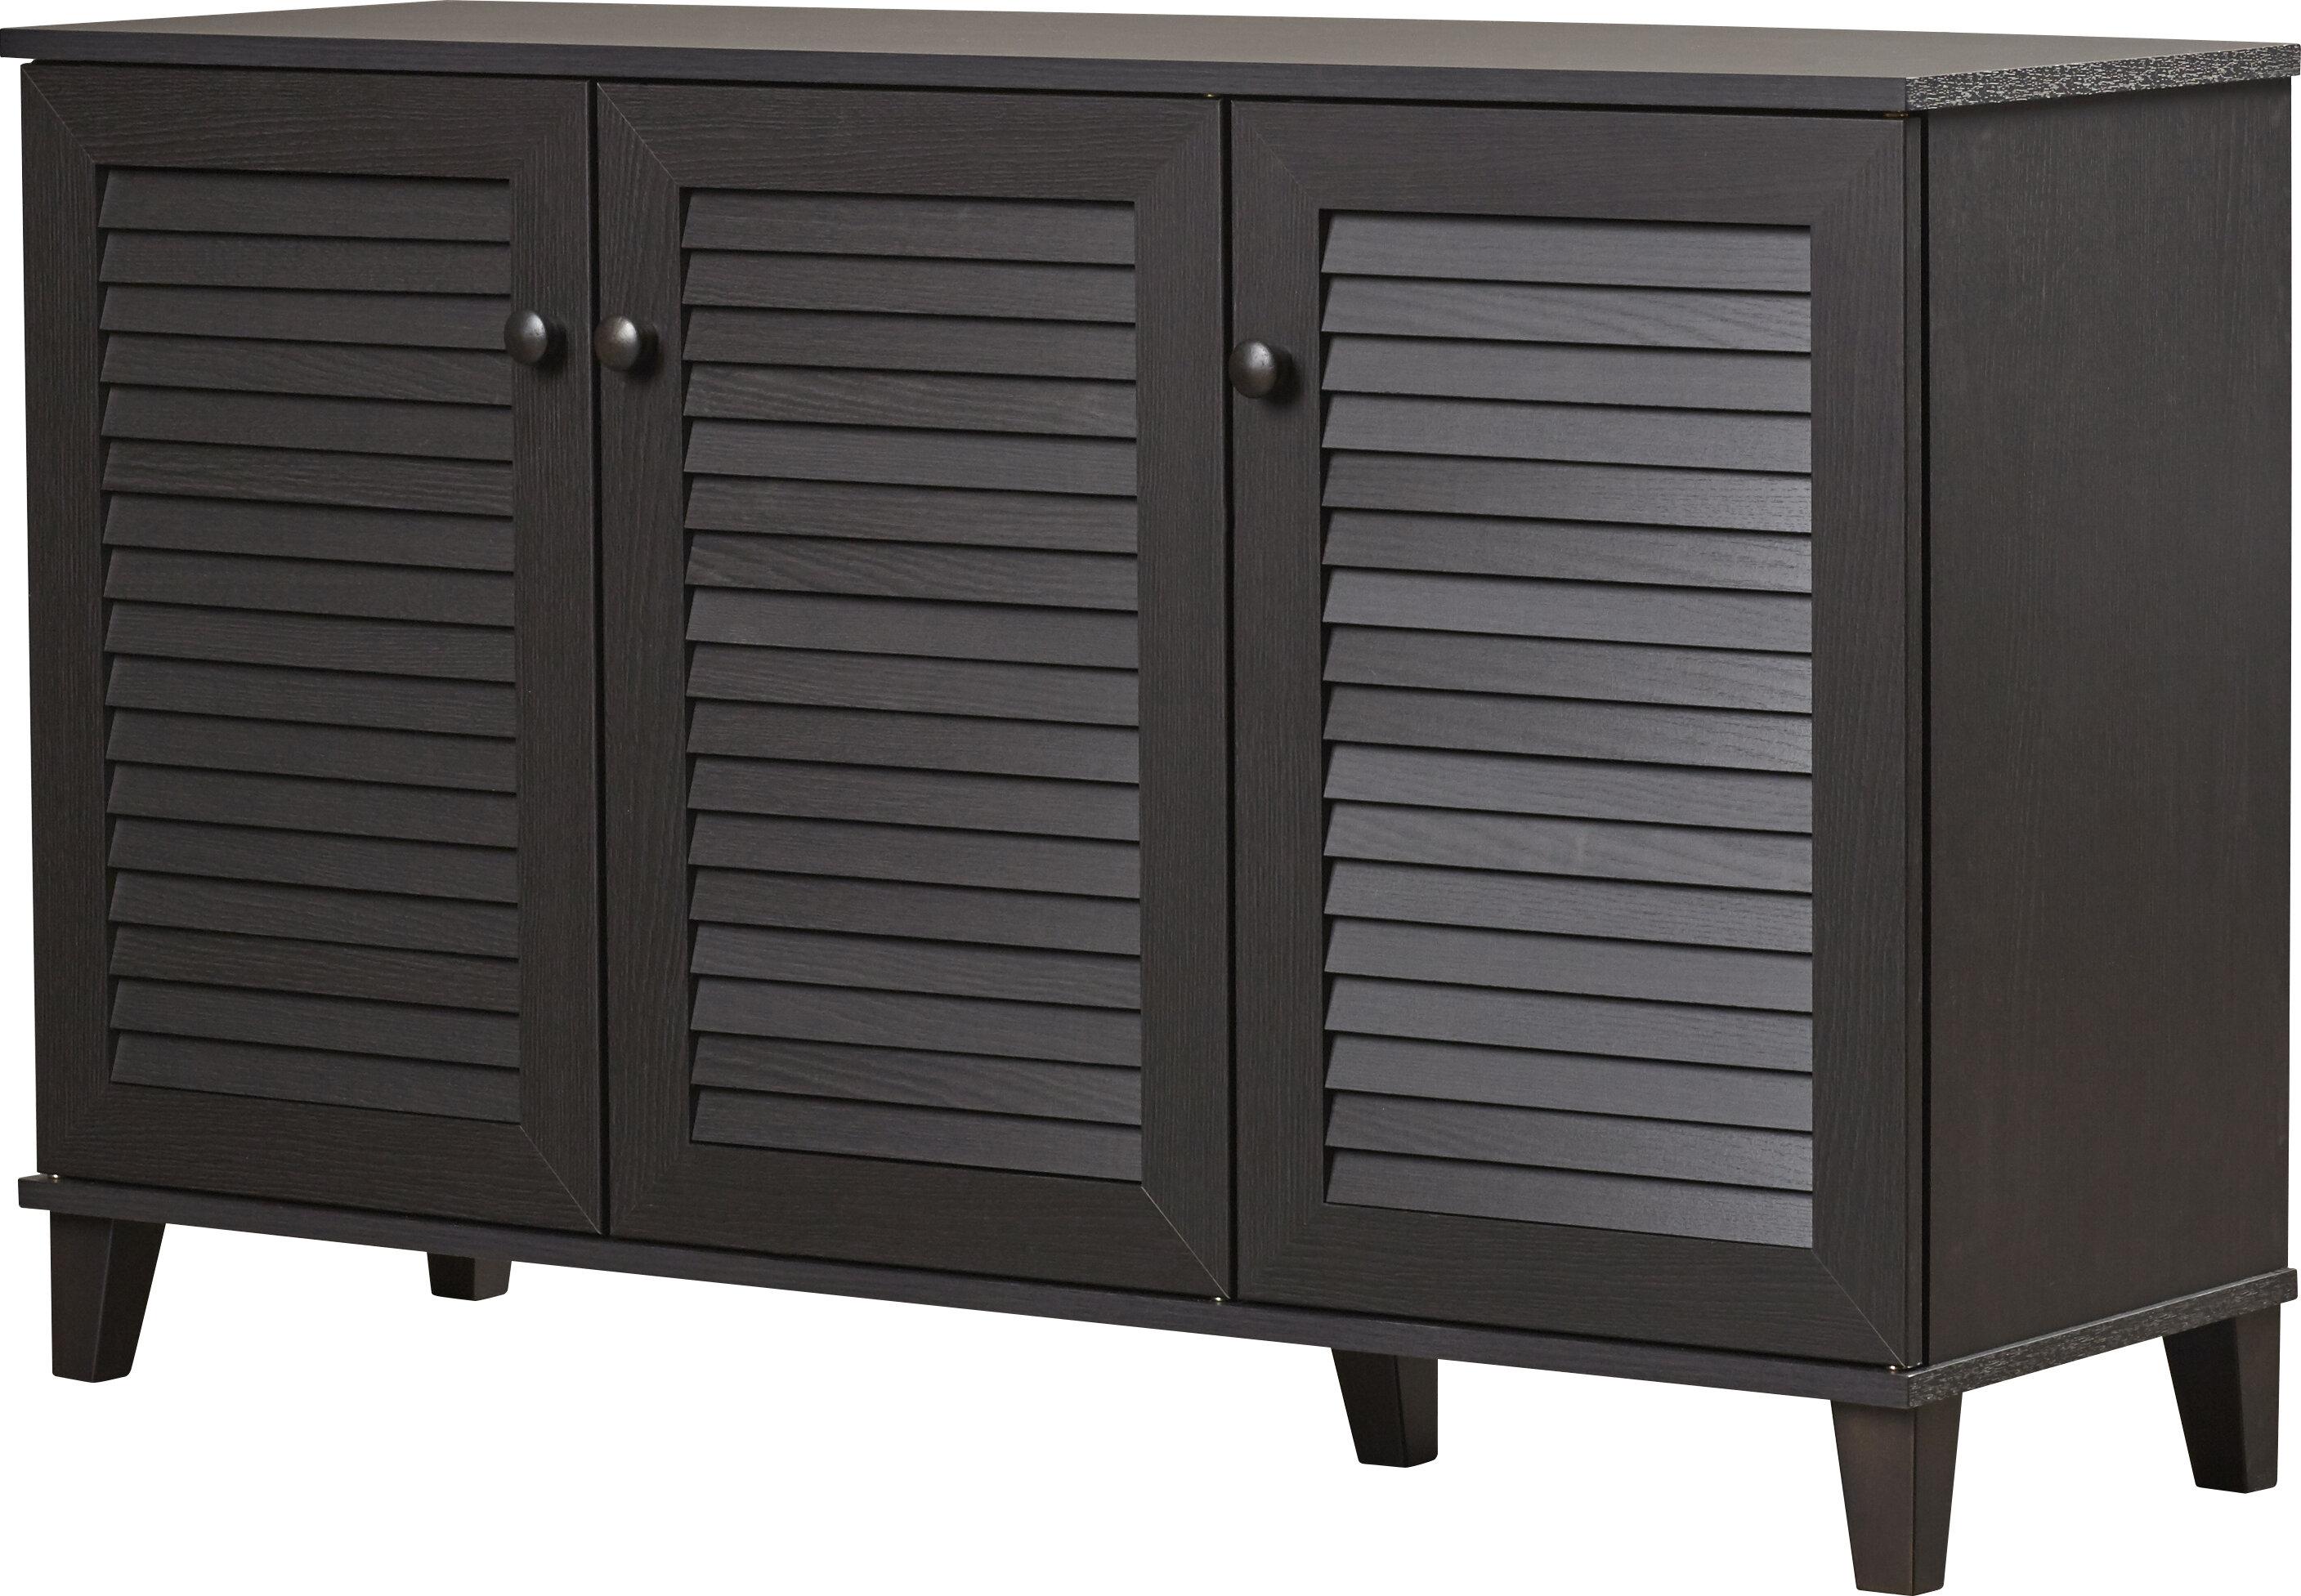 25 pair shoe storage cabinet reviews joss main